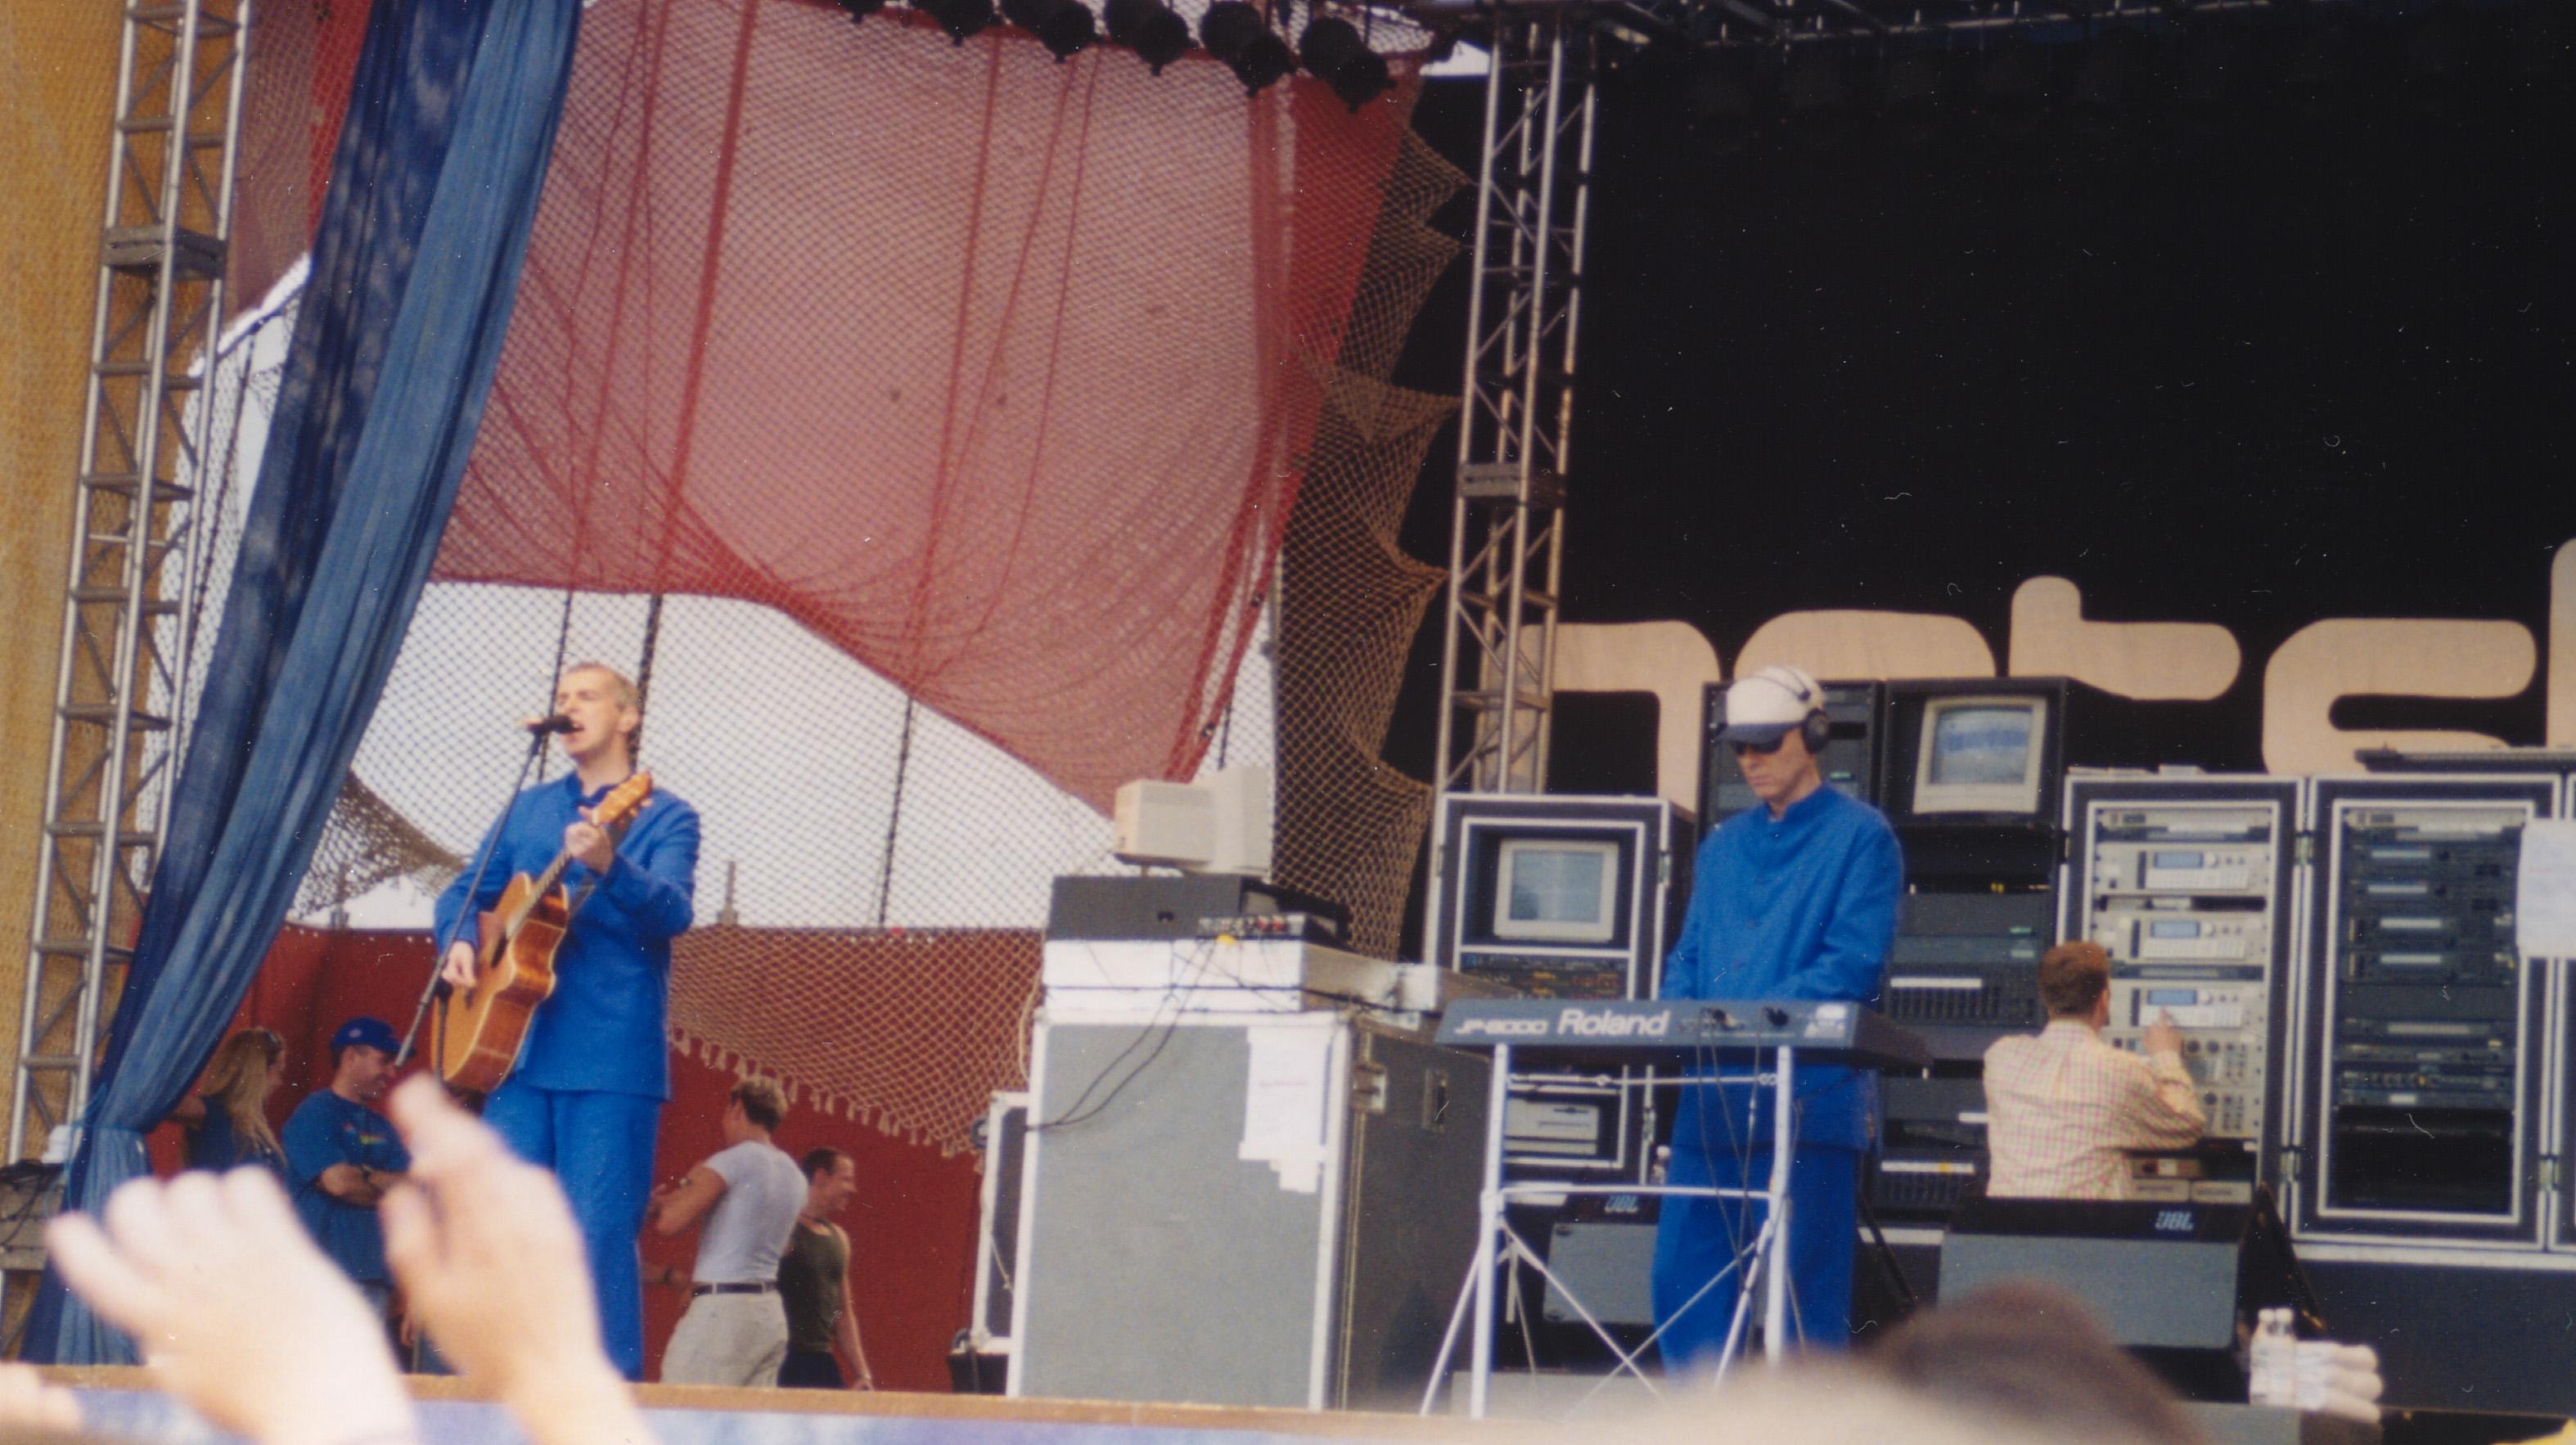 Petshopboys turku finland 1997a.jpg